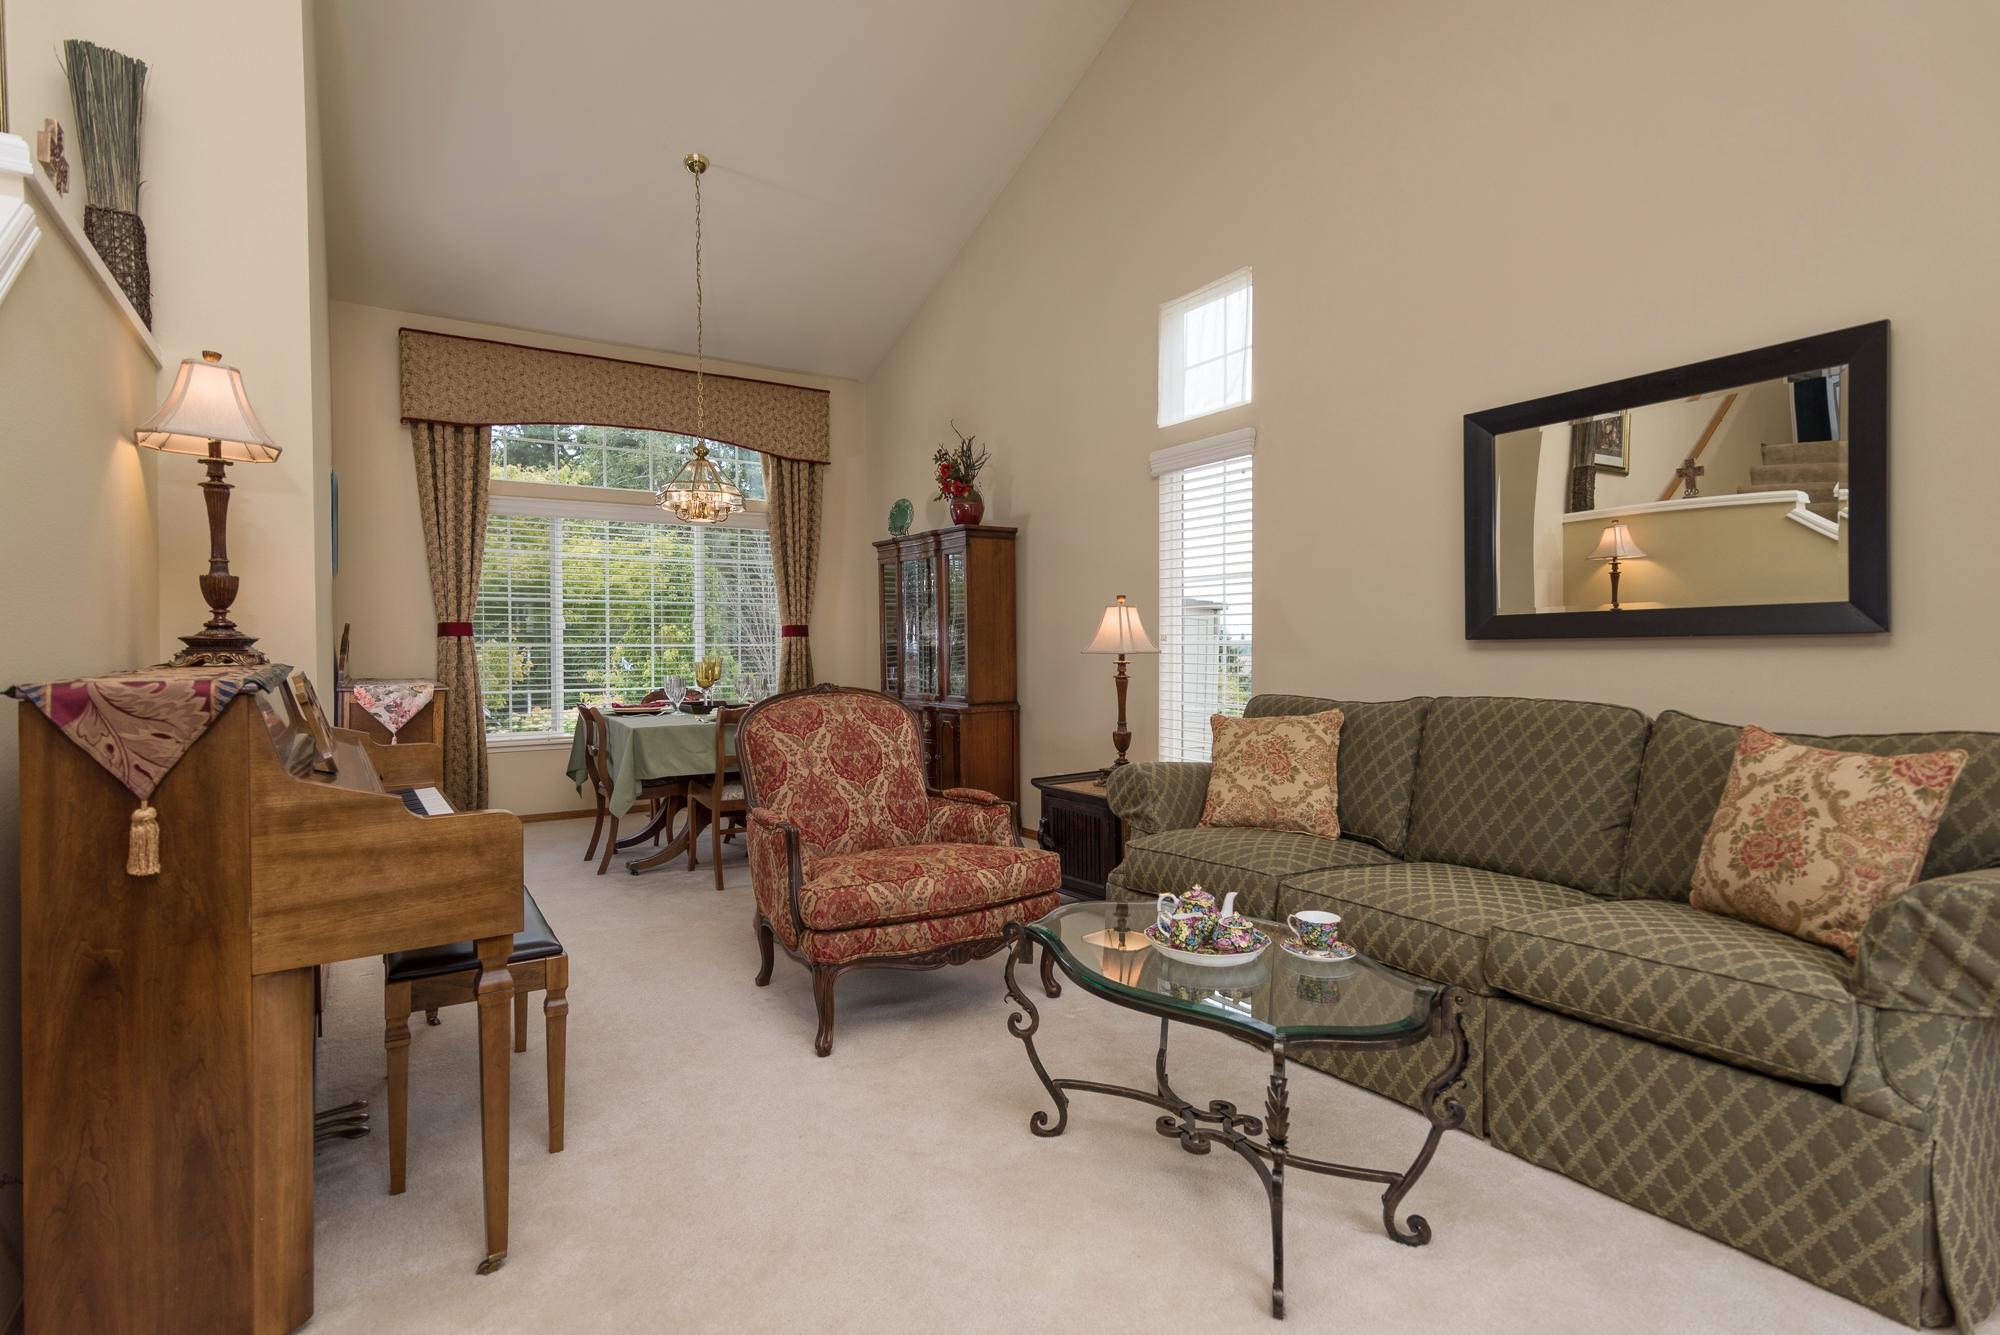 Tacoma area home interior - real estate photography